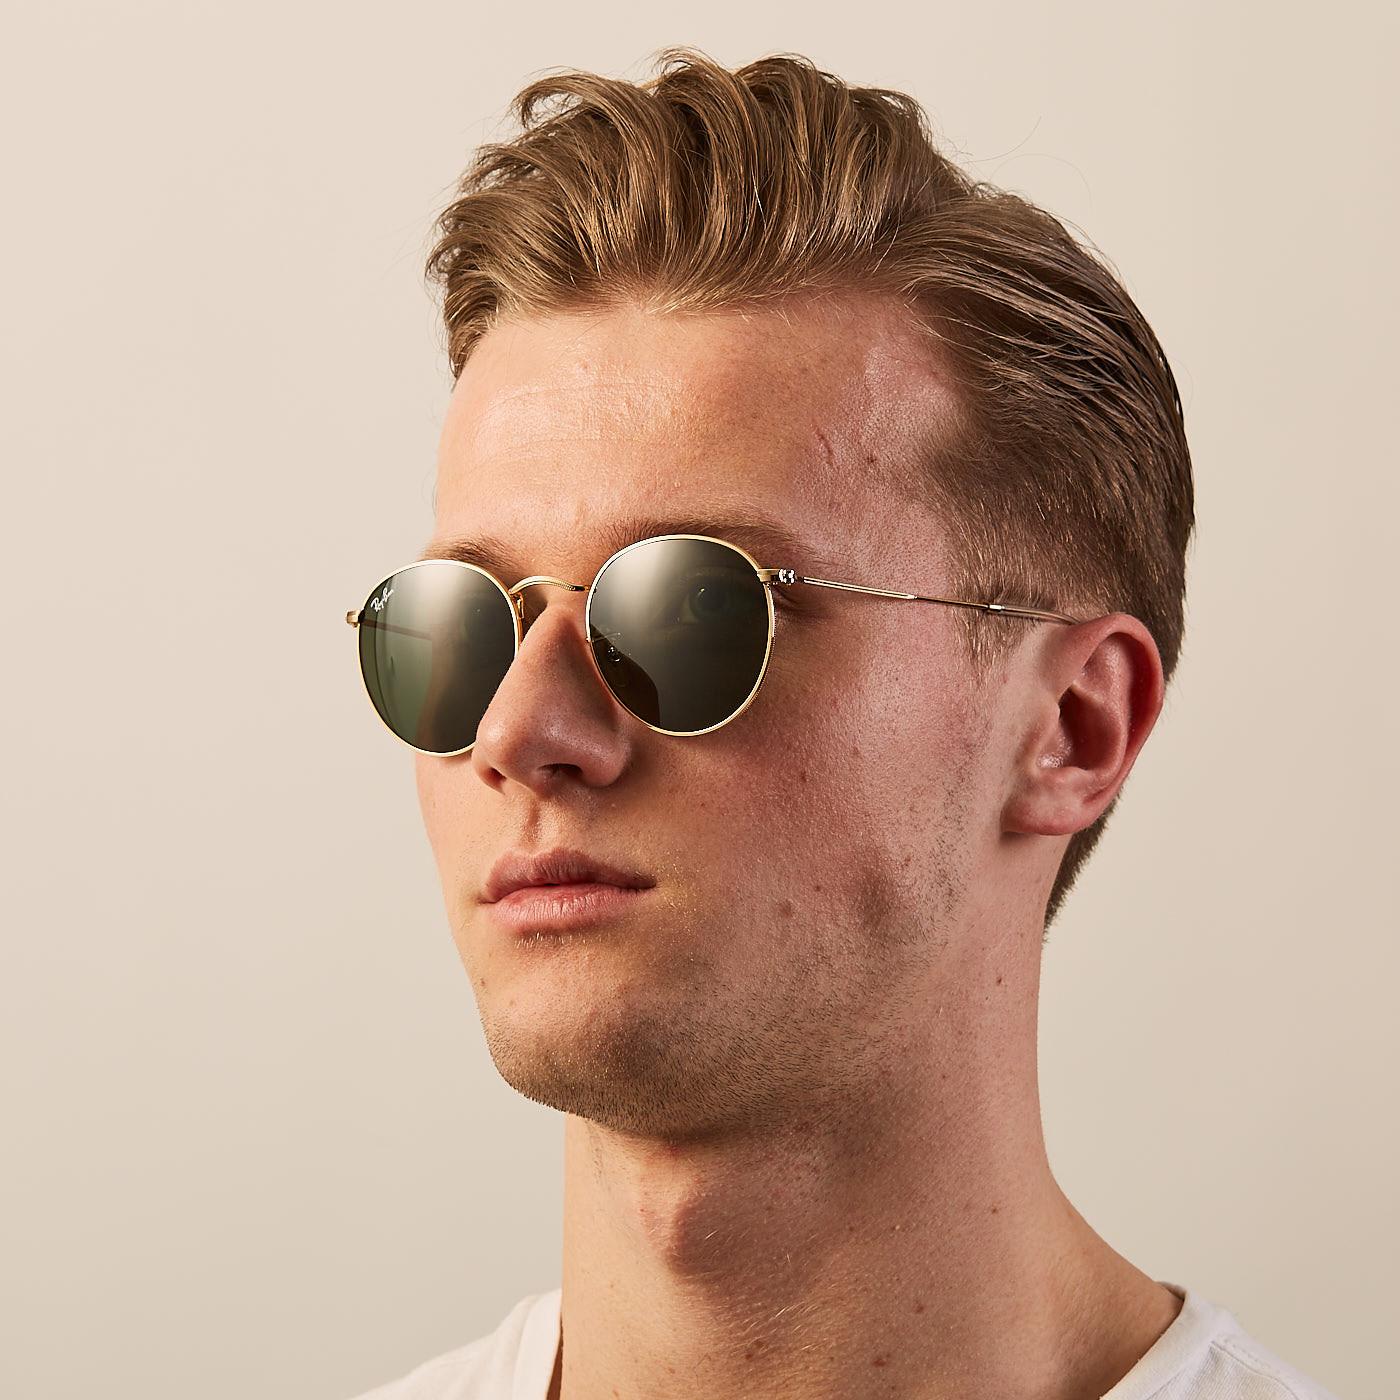 7ec69586b89be Ray-Ban Round Arista Sunglasses RB3447 001 - Sunglasses